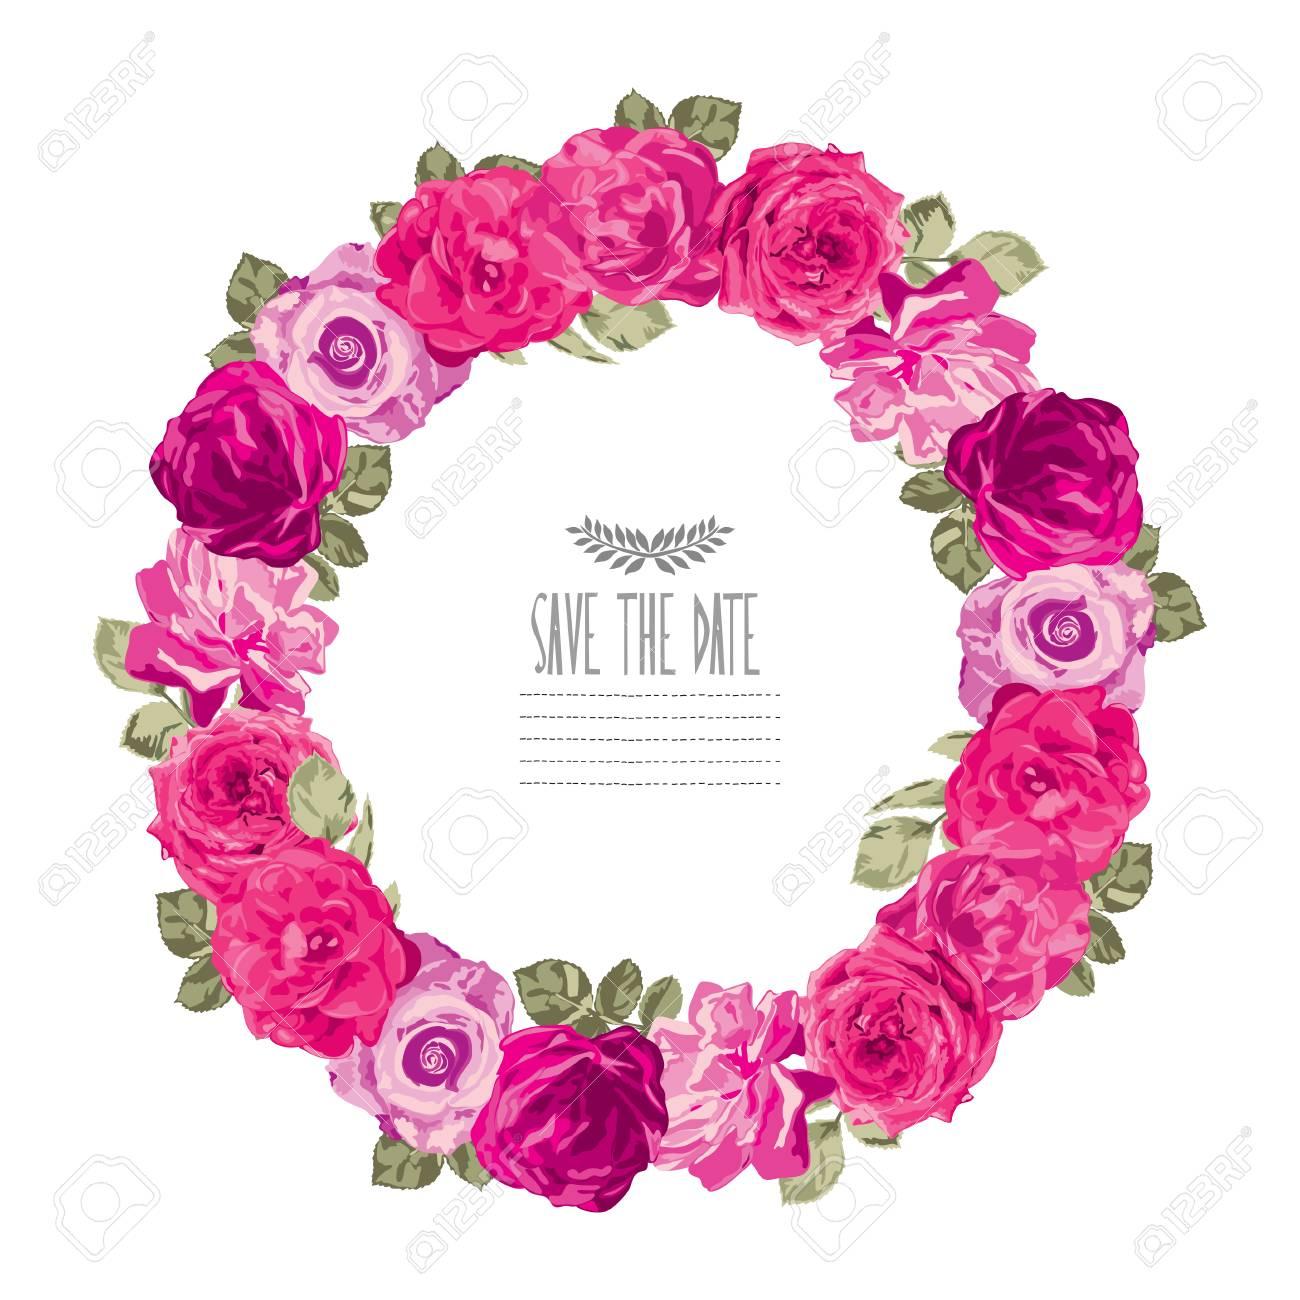 Elegant wreath with decorative pink rose flowers design element elegant wreath with decorative pink rose flowers design element can be used for wedding mightylinksfo